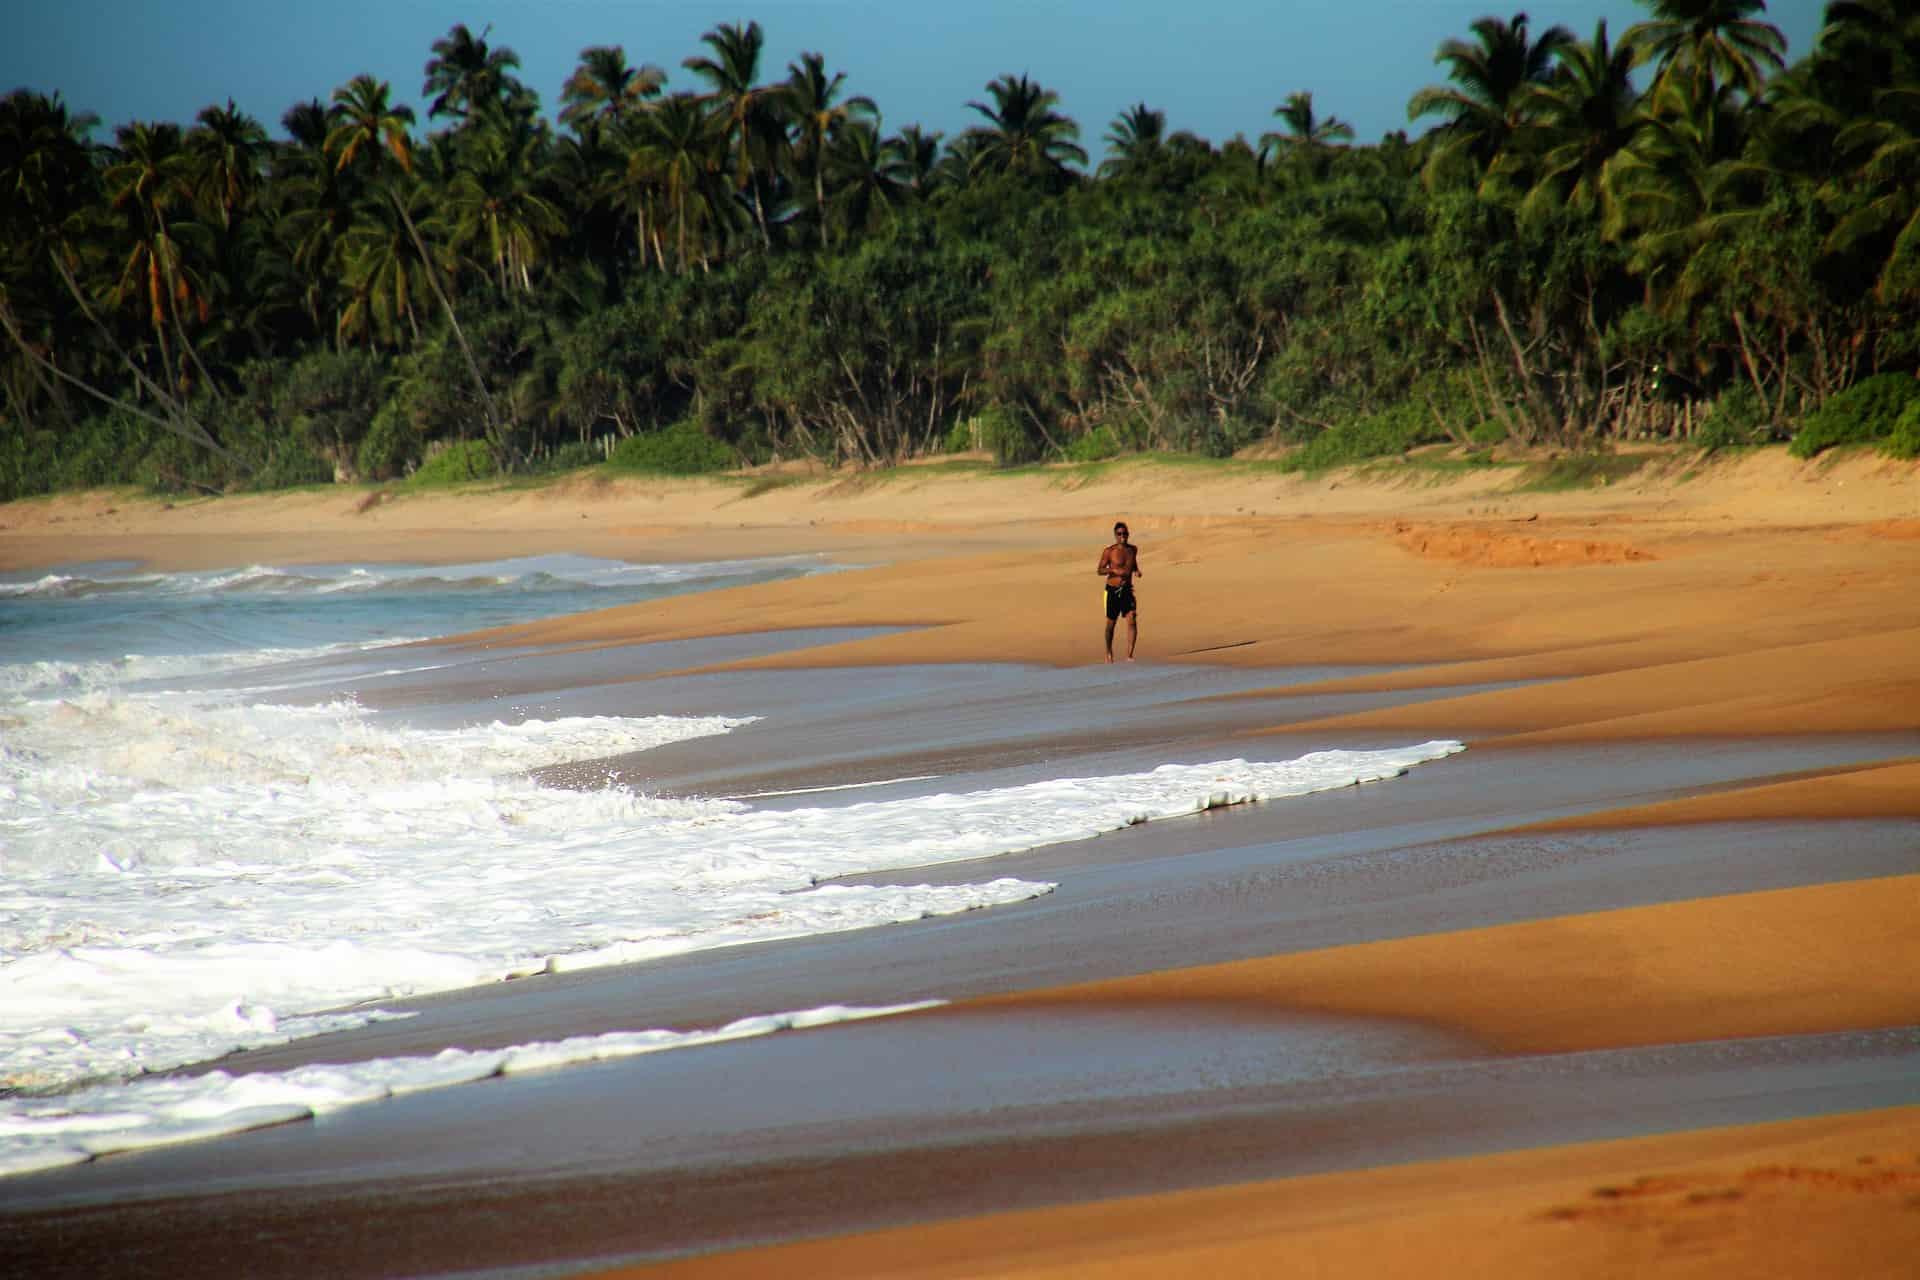 Sri Lanka Flüge nur 529,98€ Hin & Rückflug - Flug nach Colombo